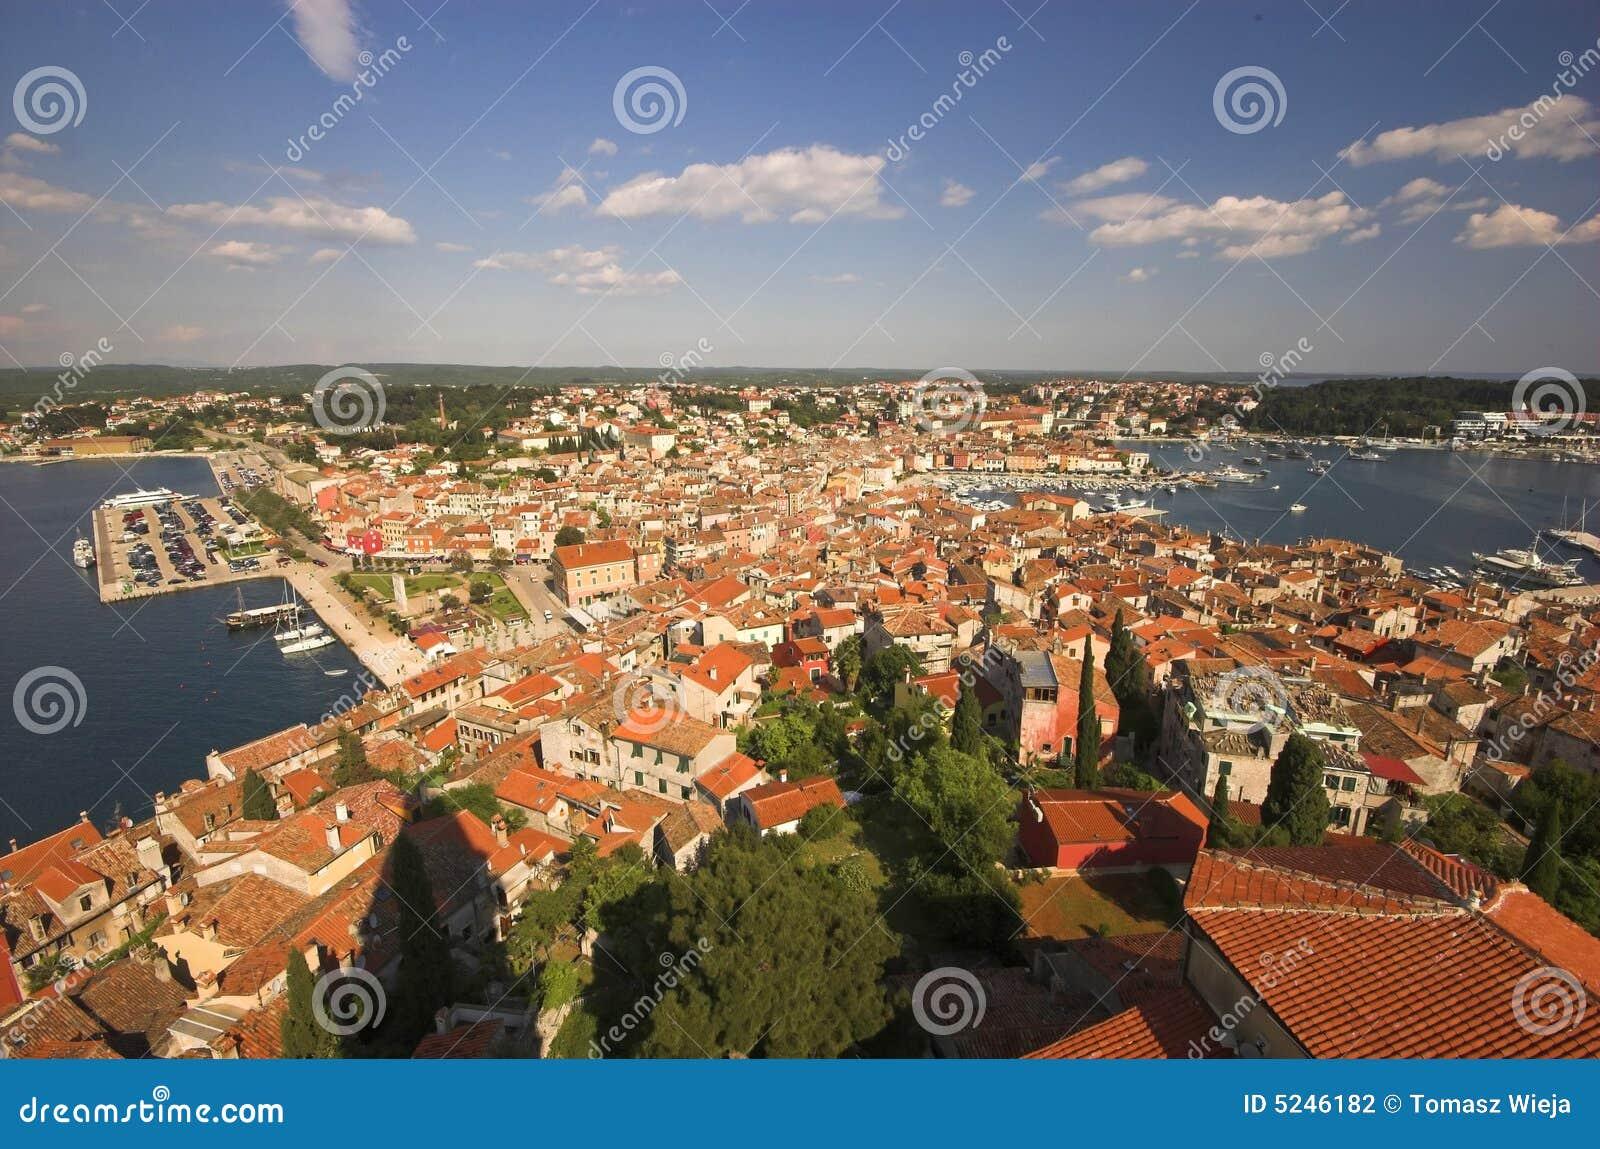 A view of Rovinj